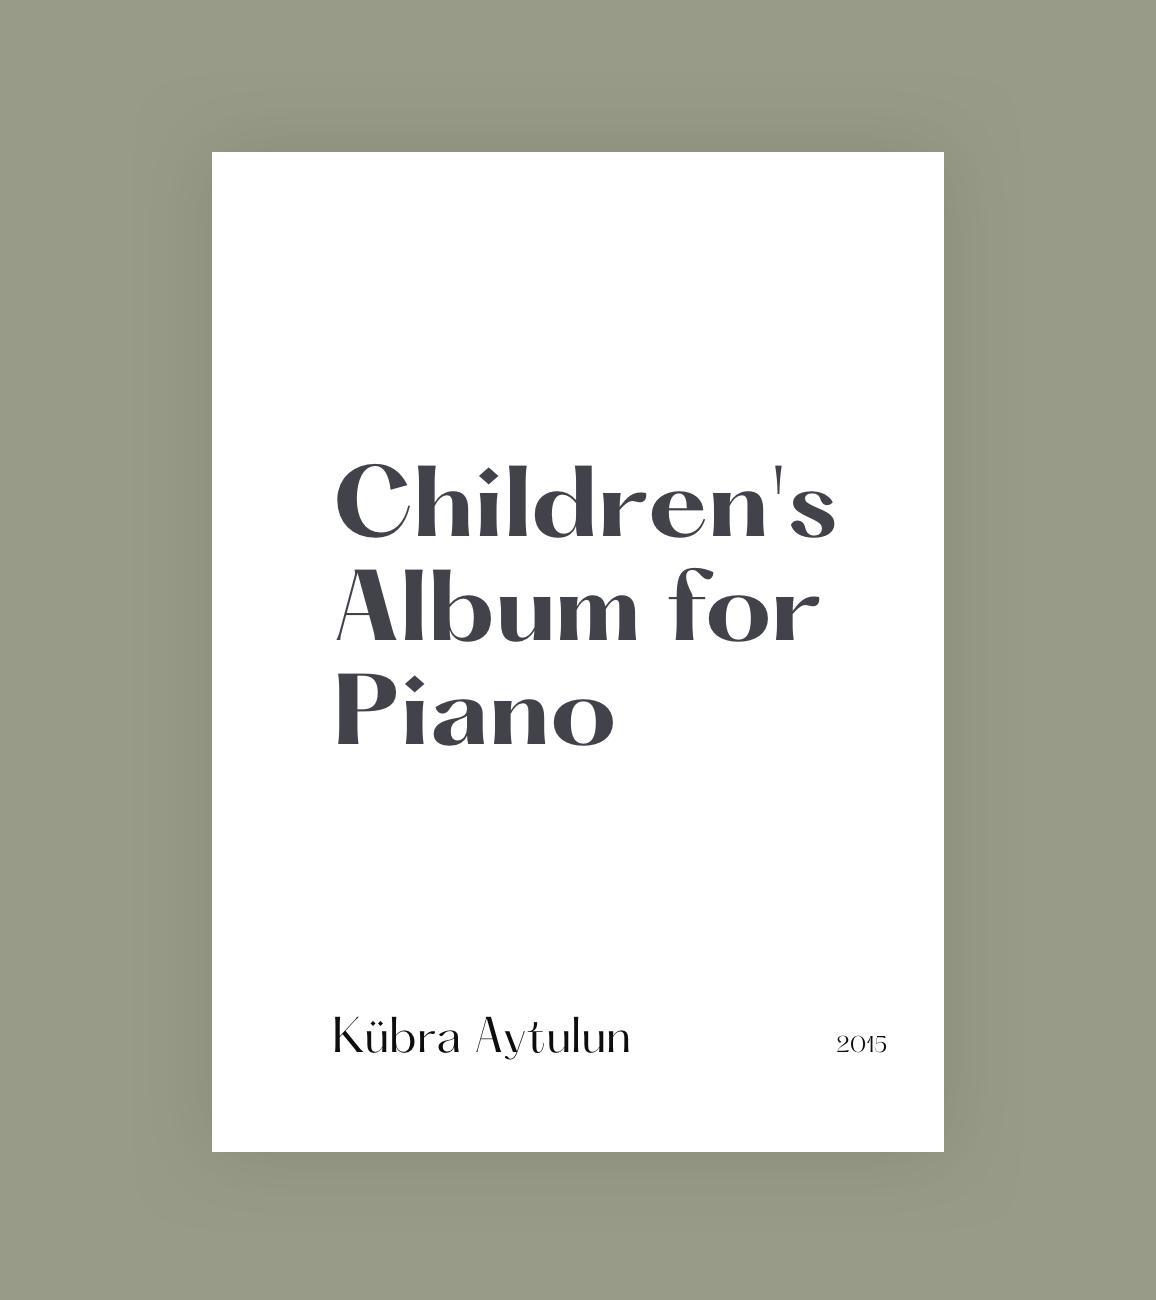 Childrens-Album-for-Piano